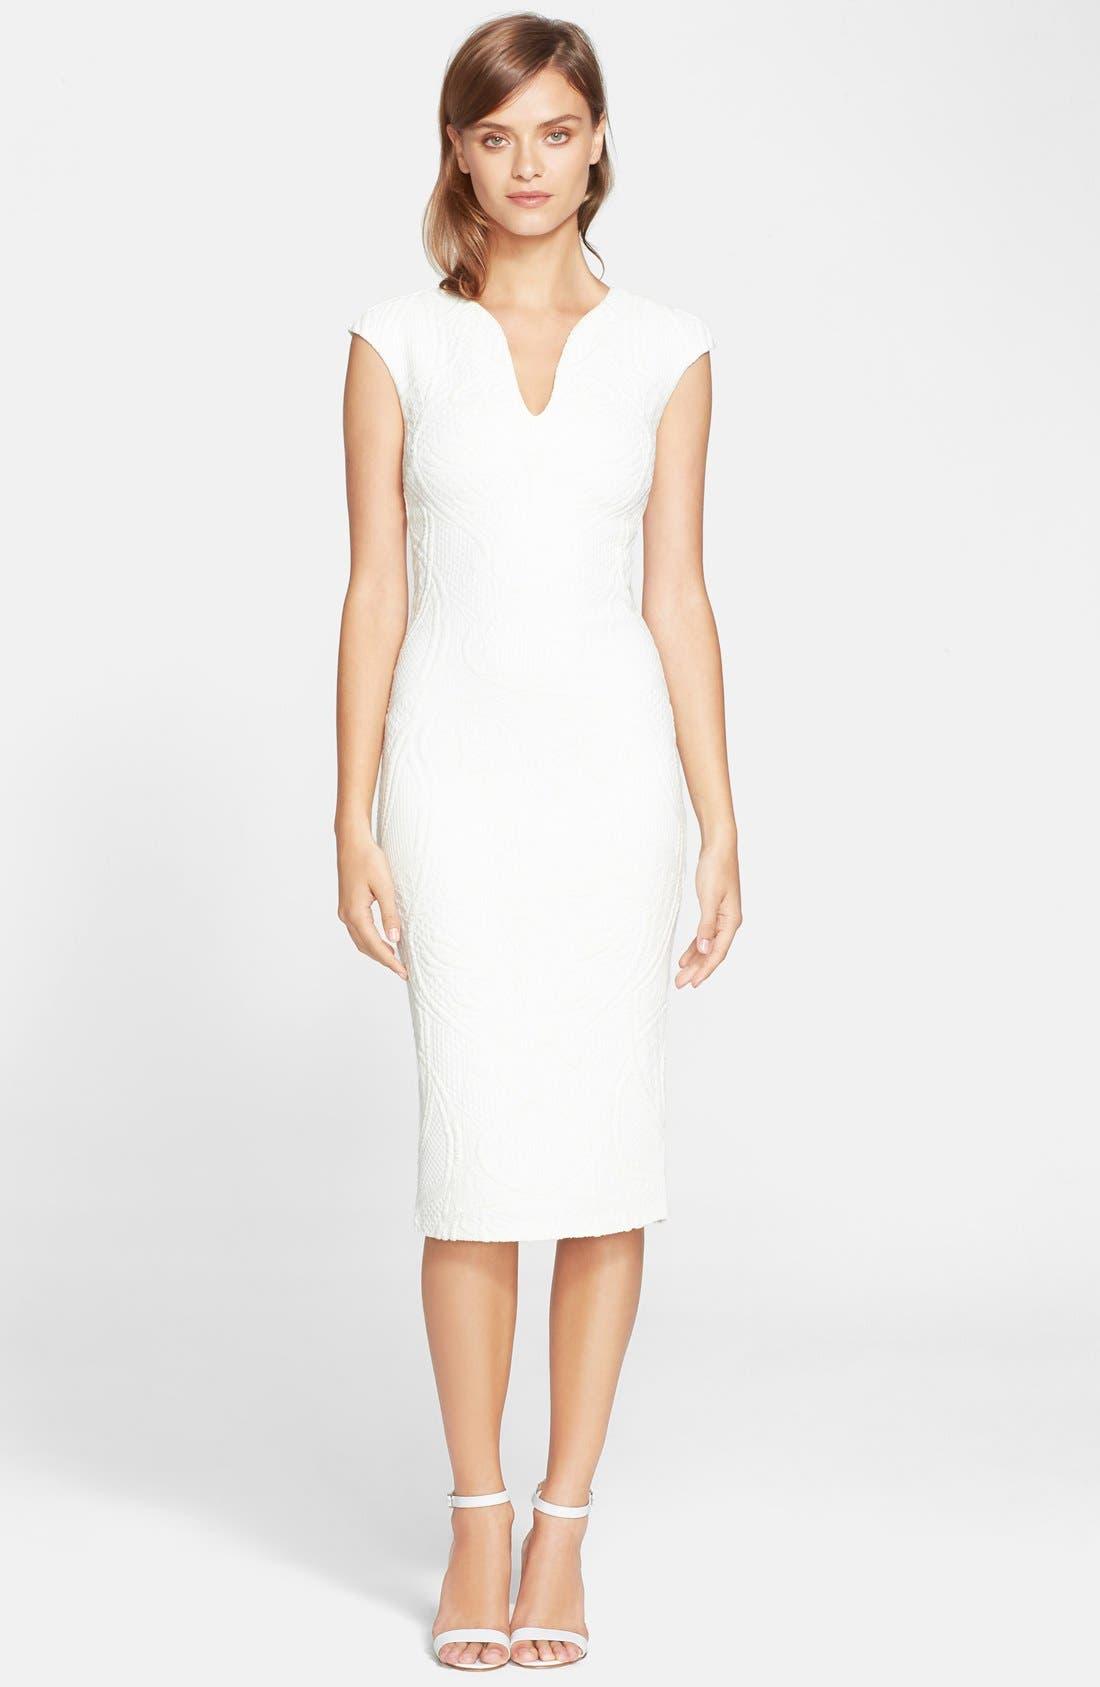 Alternate Image 1 Selected - Ted Baker London 'Sancha' Textured Midi Dress